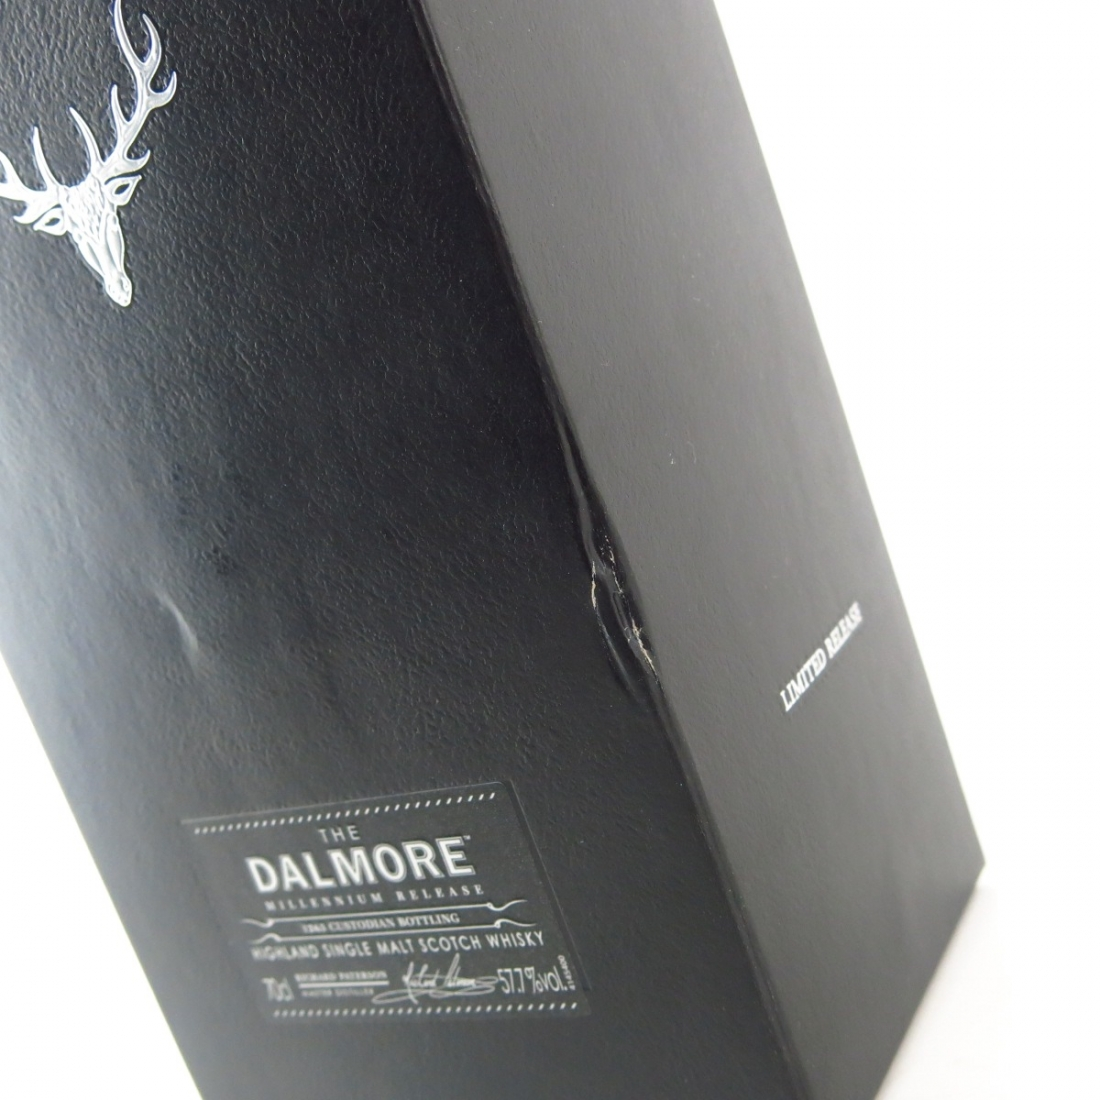 Dalmore Millennium Release 1263 Custodian Bottling 2012 / 1st Release